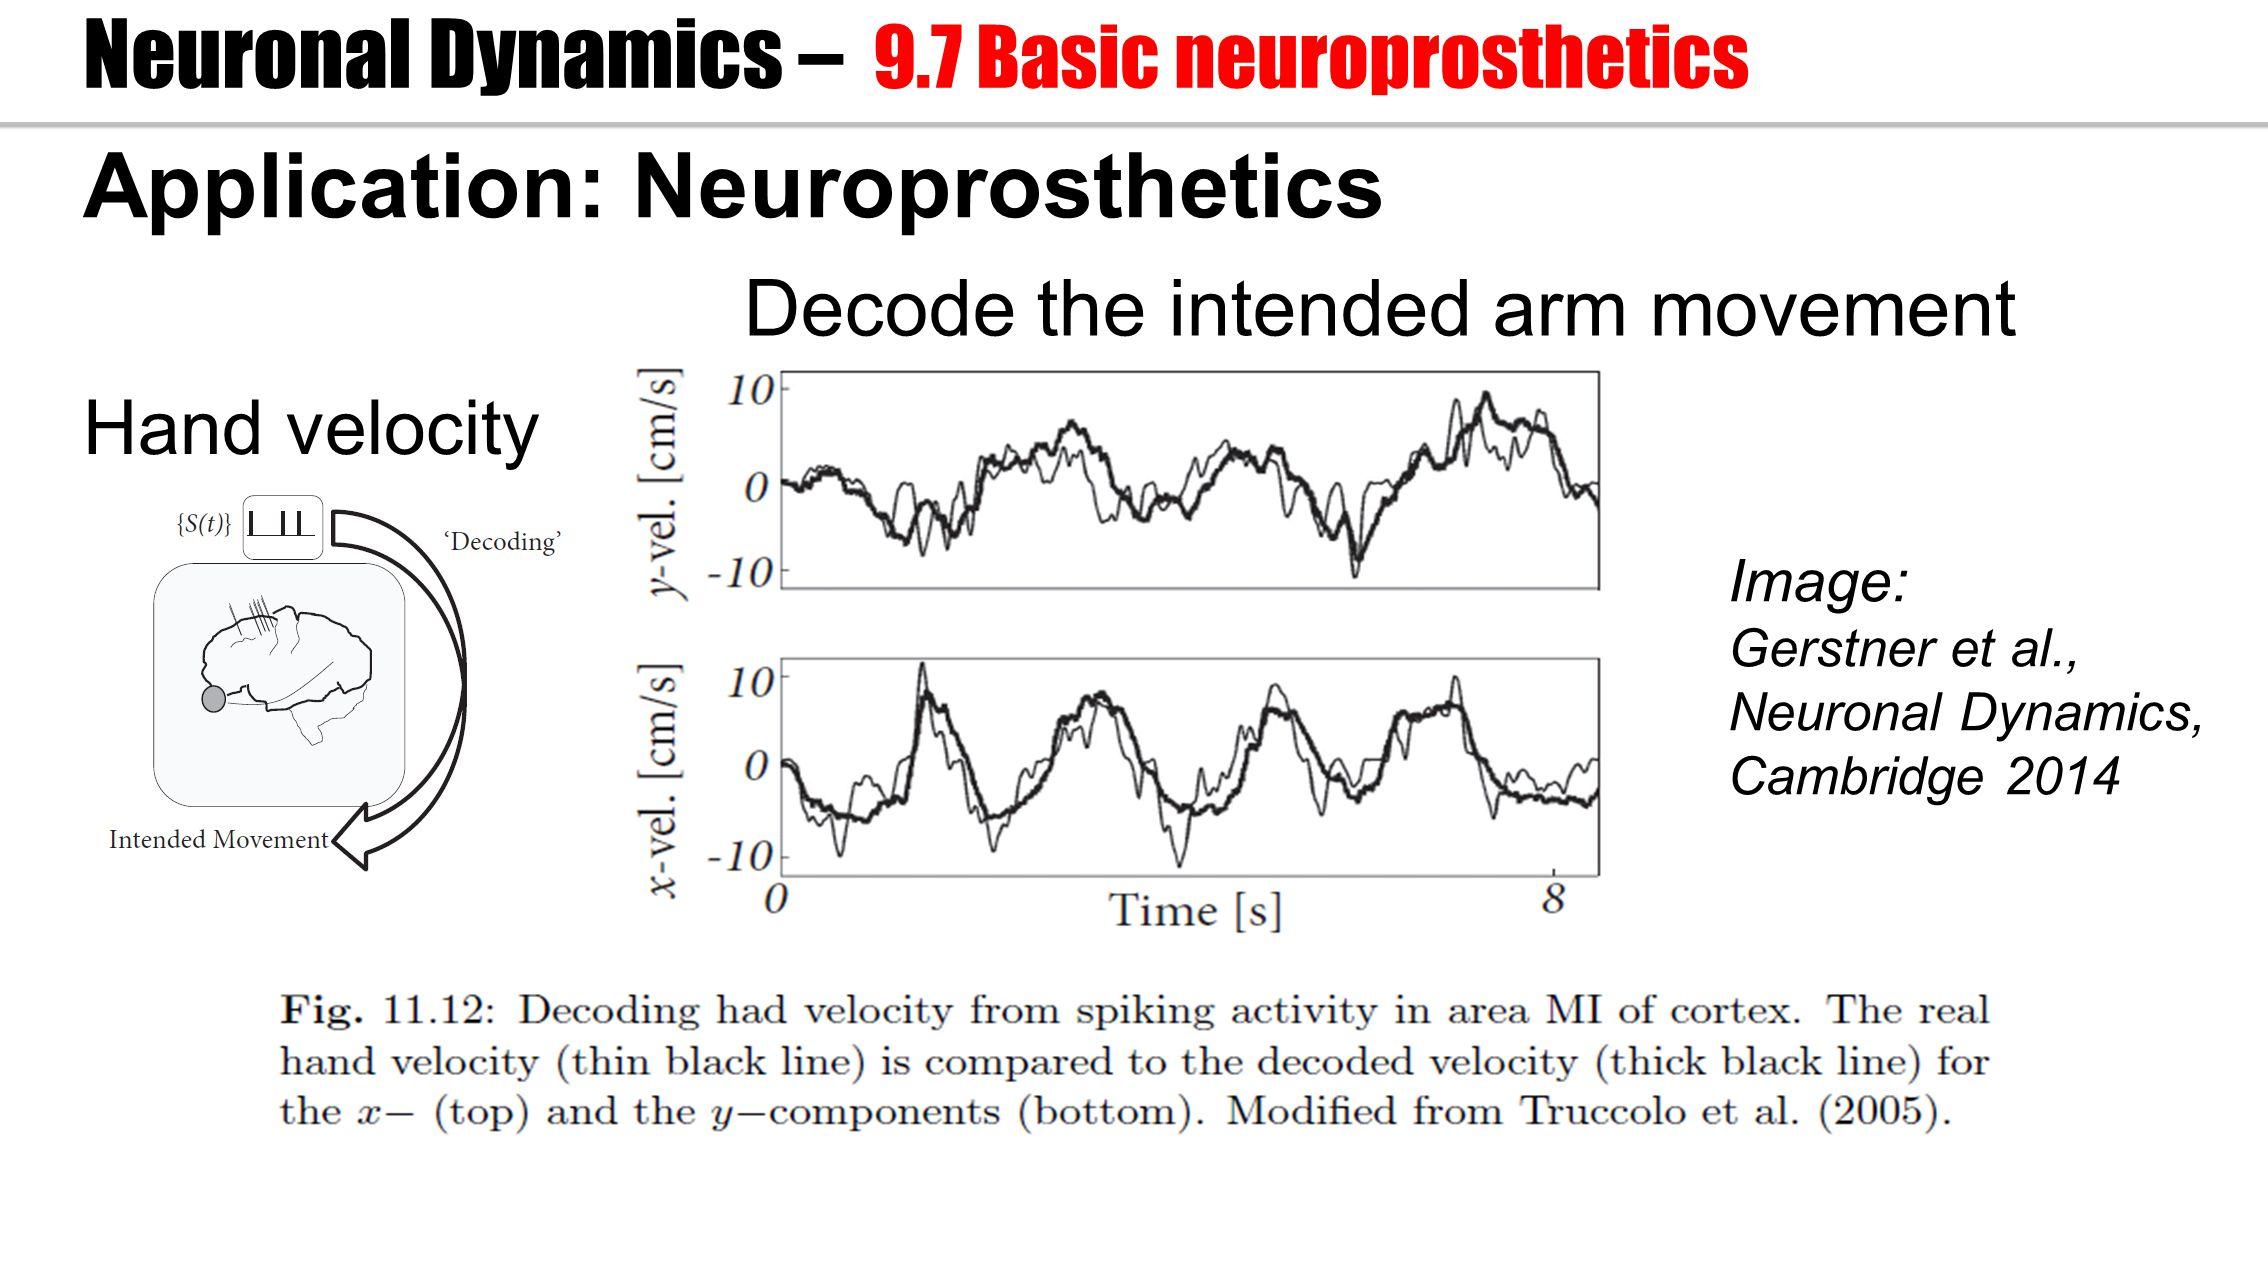 Application: Neuroprosthetics Hand velocity Decode the intended arm movement Neuronal Dynamics – 9.7 Basic neuroprosthetics Image: Gerstner et al., Neuronal Dynamics, Cambridge 2014